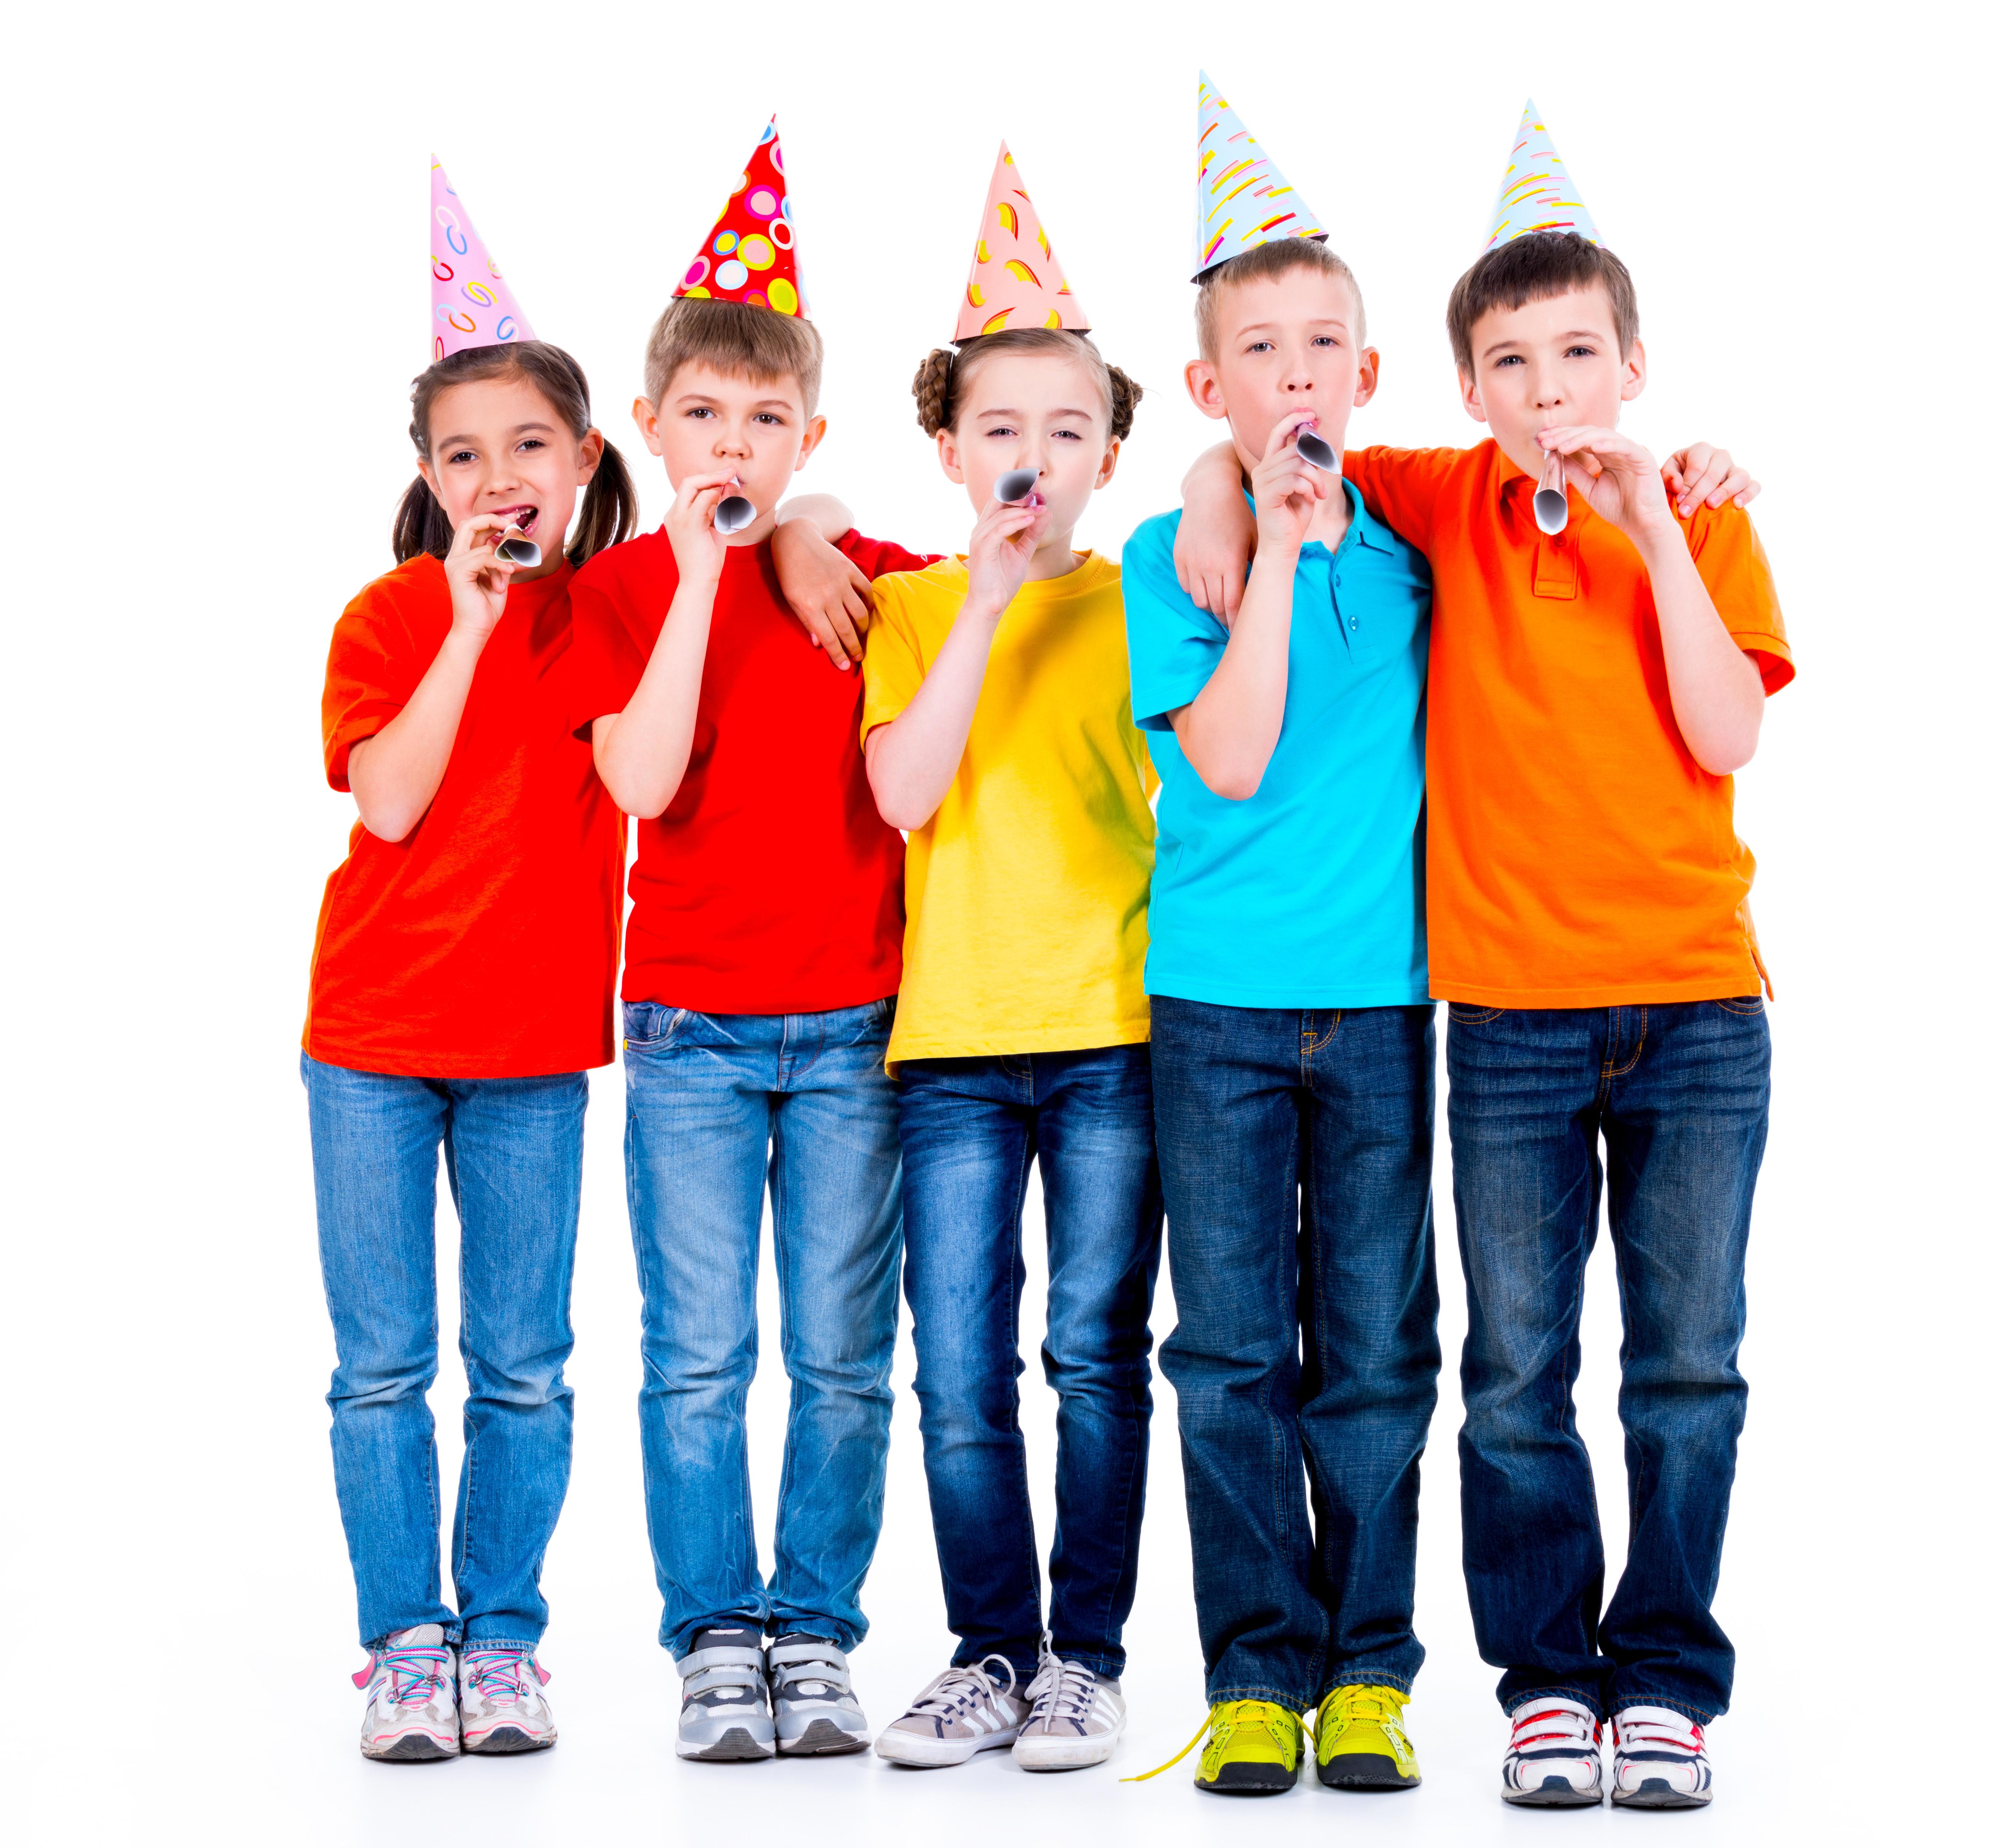 Kids Birthday Party Pasadena Party Ideas Fun Activities